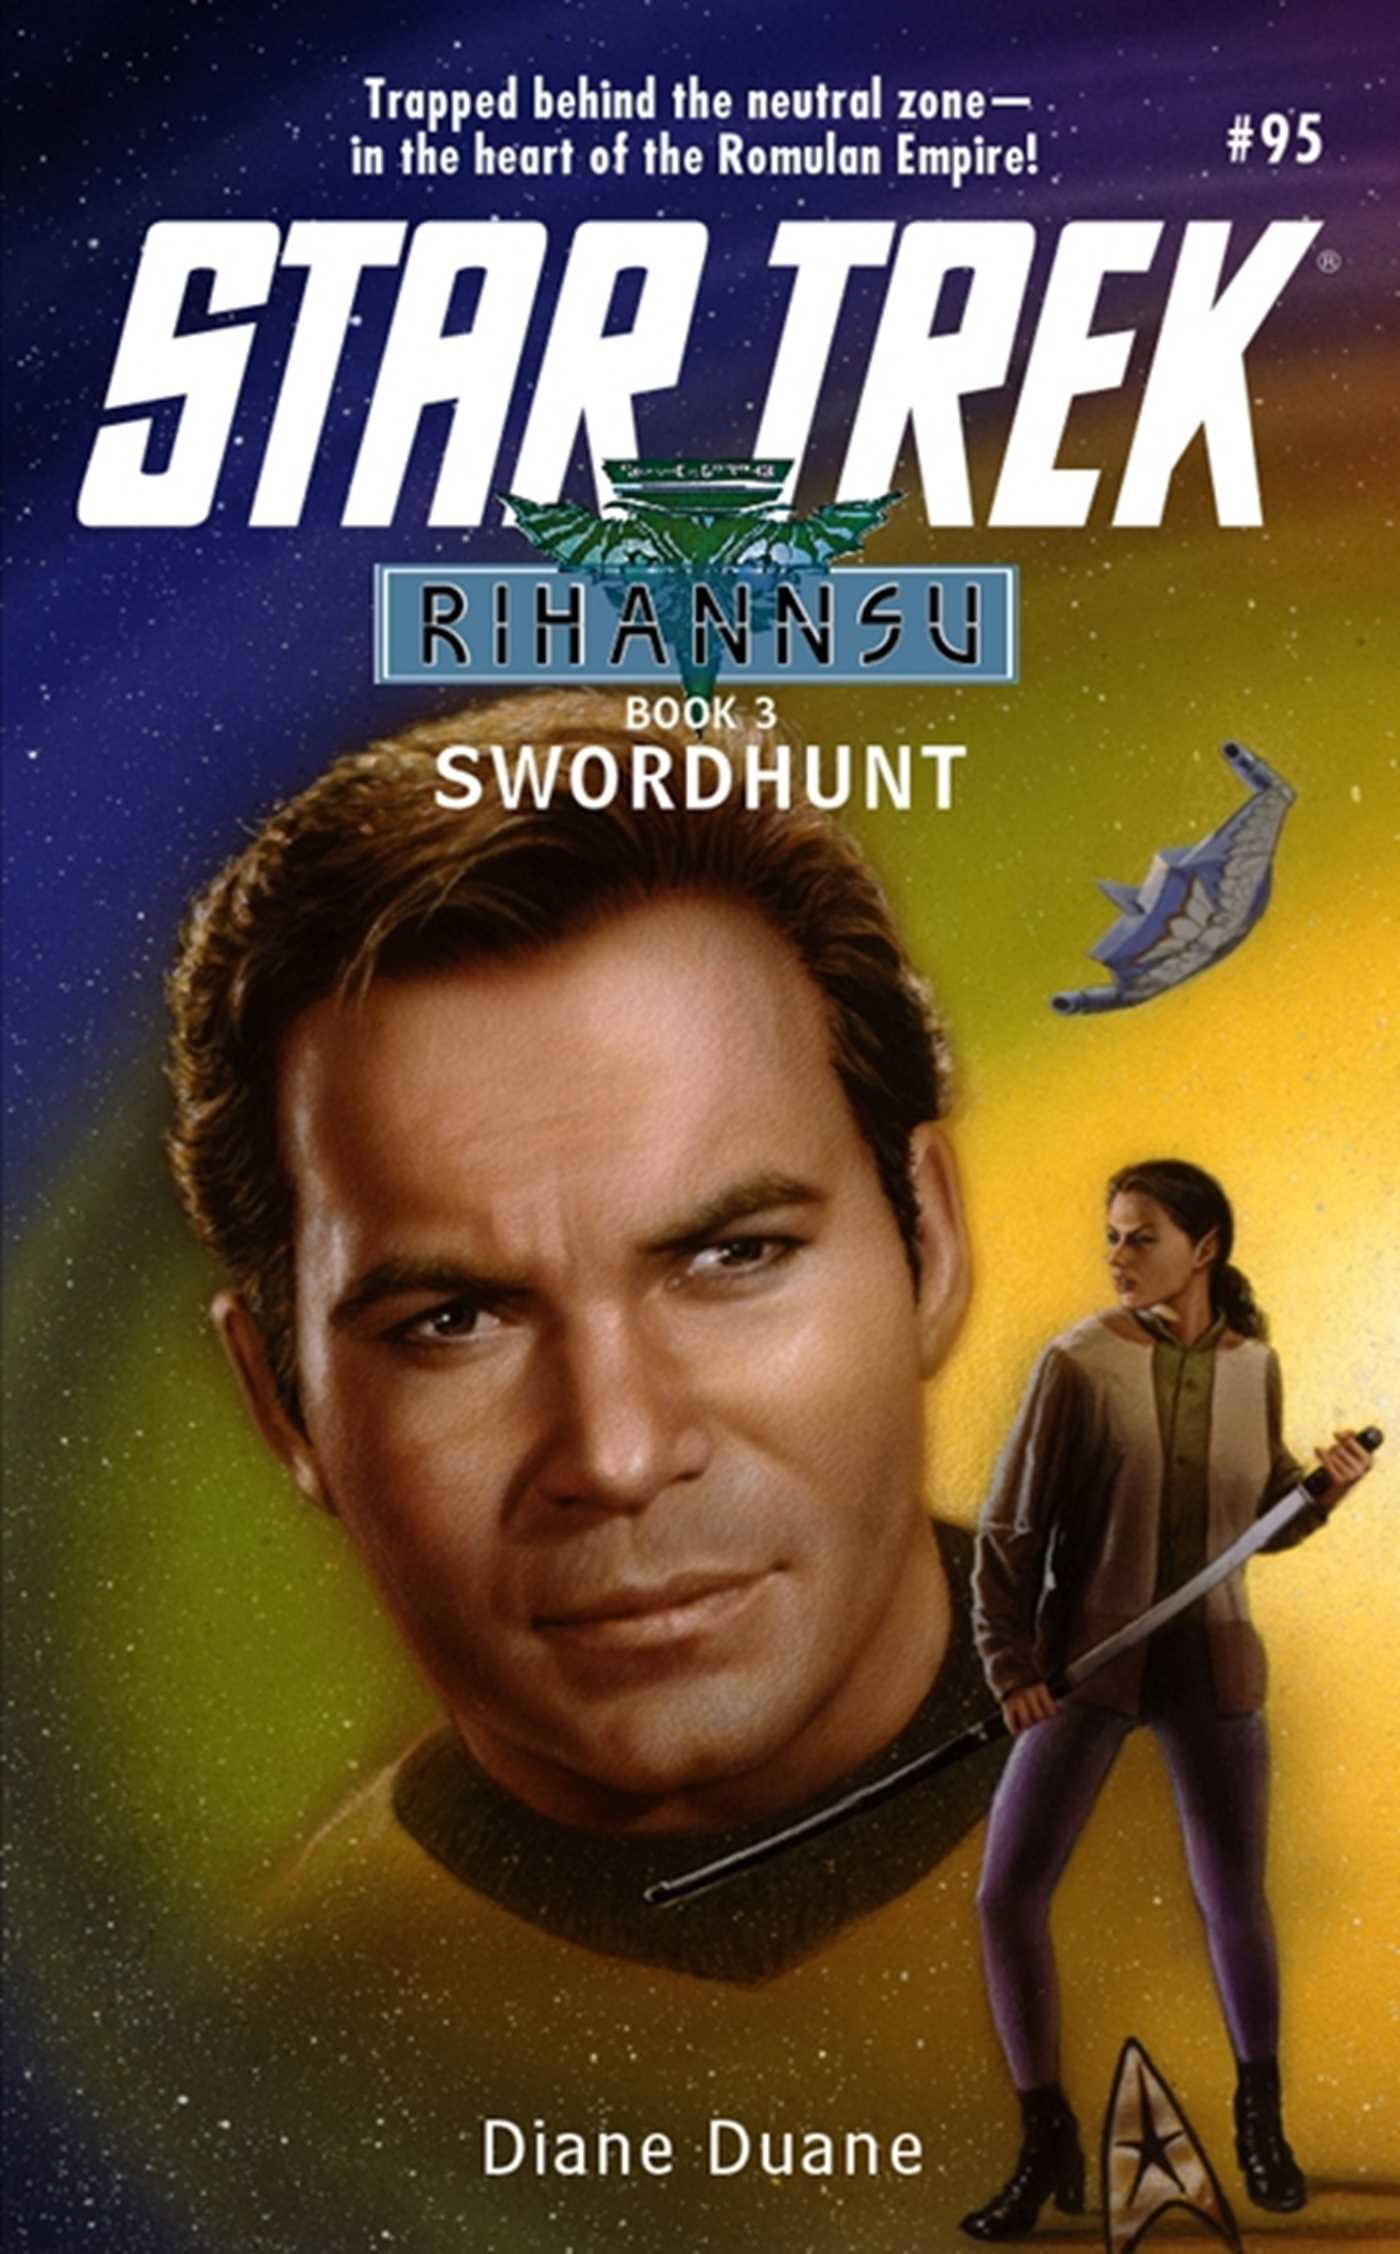 Star trek the original series rihannsu 3 swordhunt 9780743422277 hr